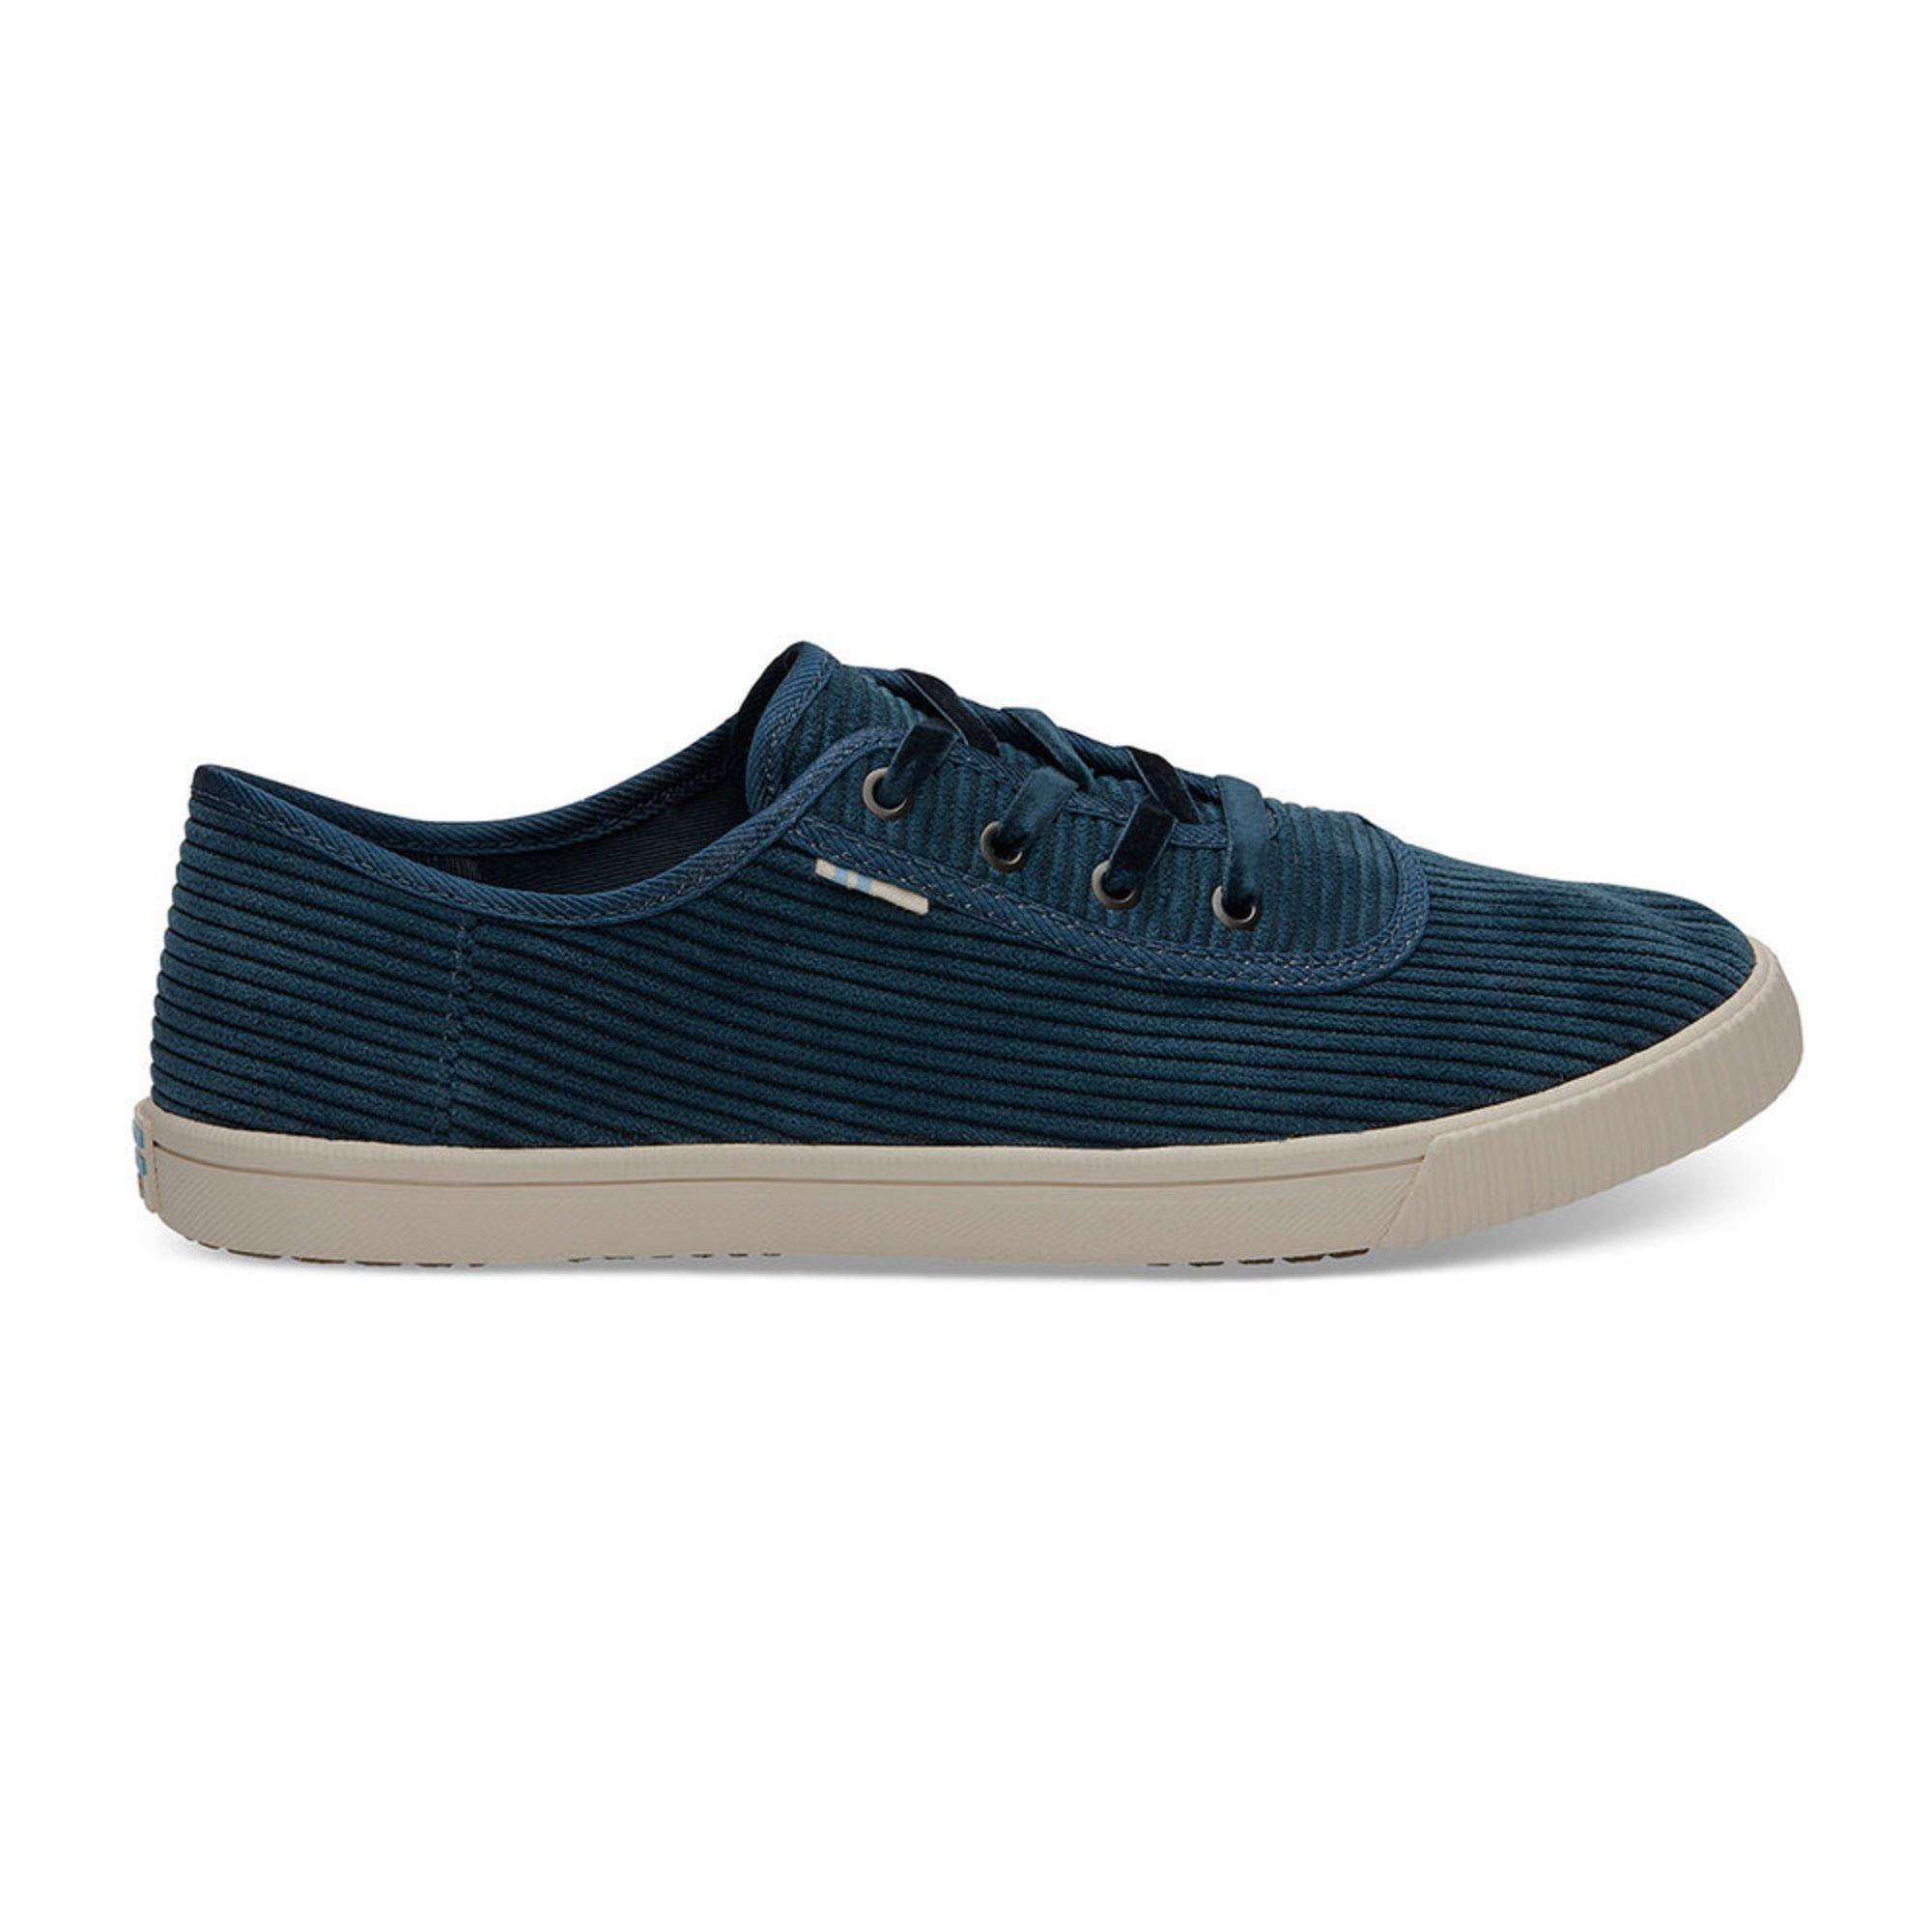 cb5d63481d Toms Women s Carmel Atlantic Corduroy Sneaker